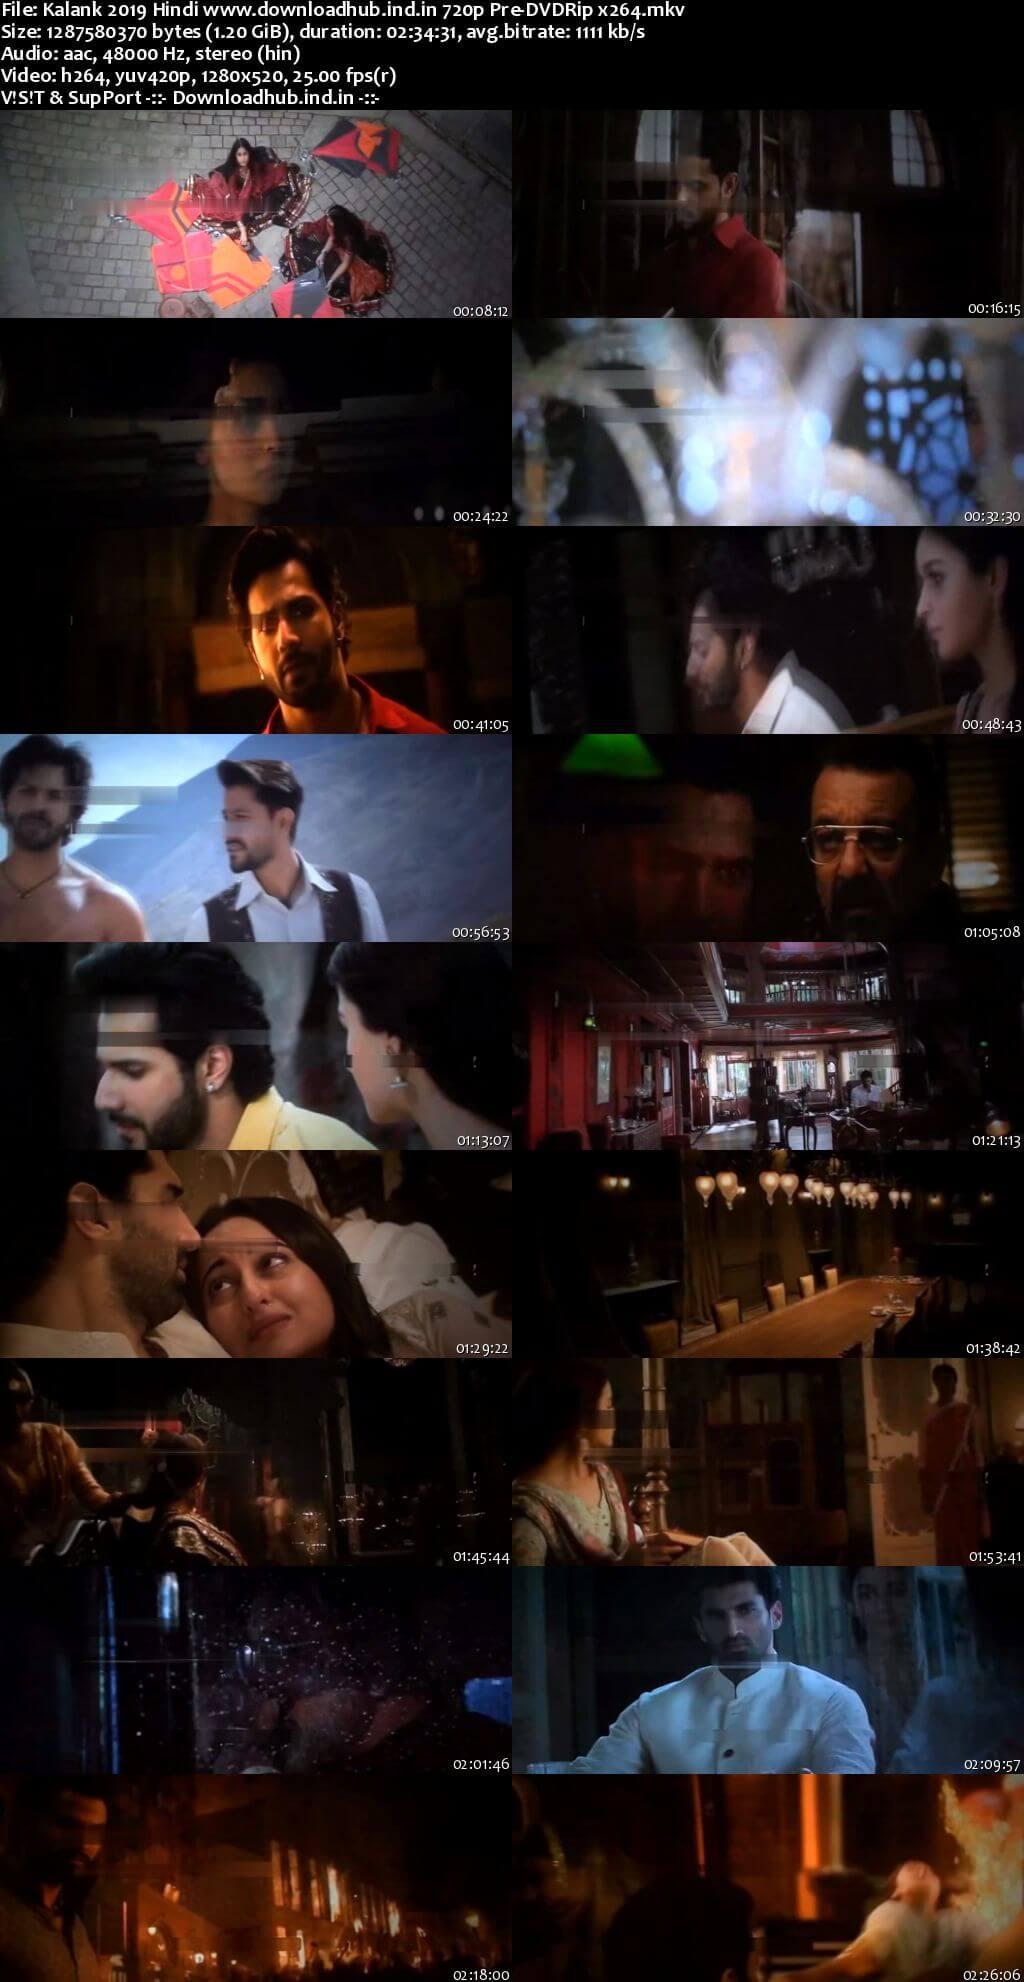 Kalank 2019 Hindi 720p Pre-DVDRip x264